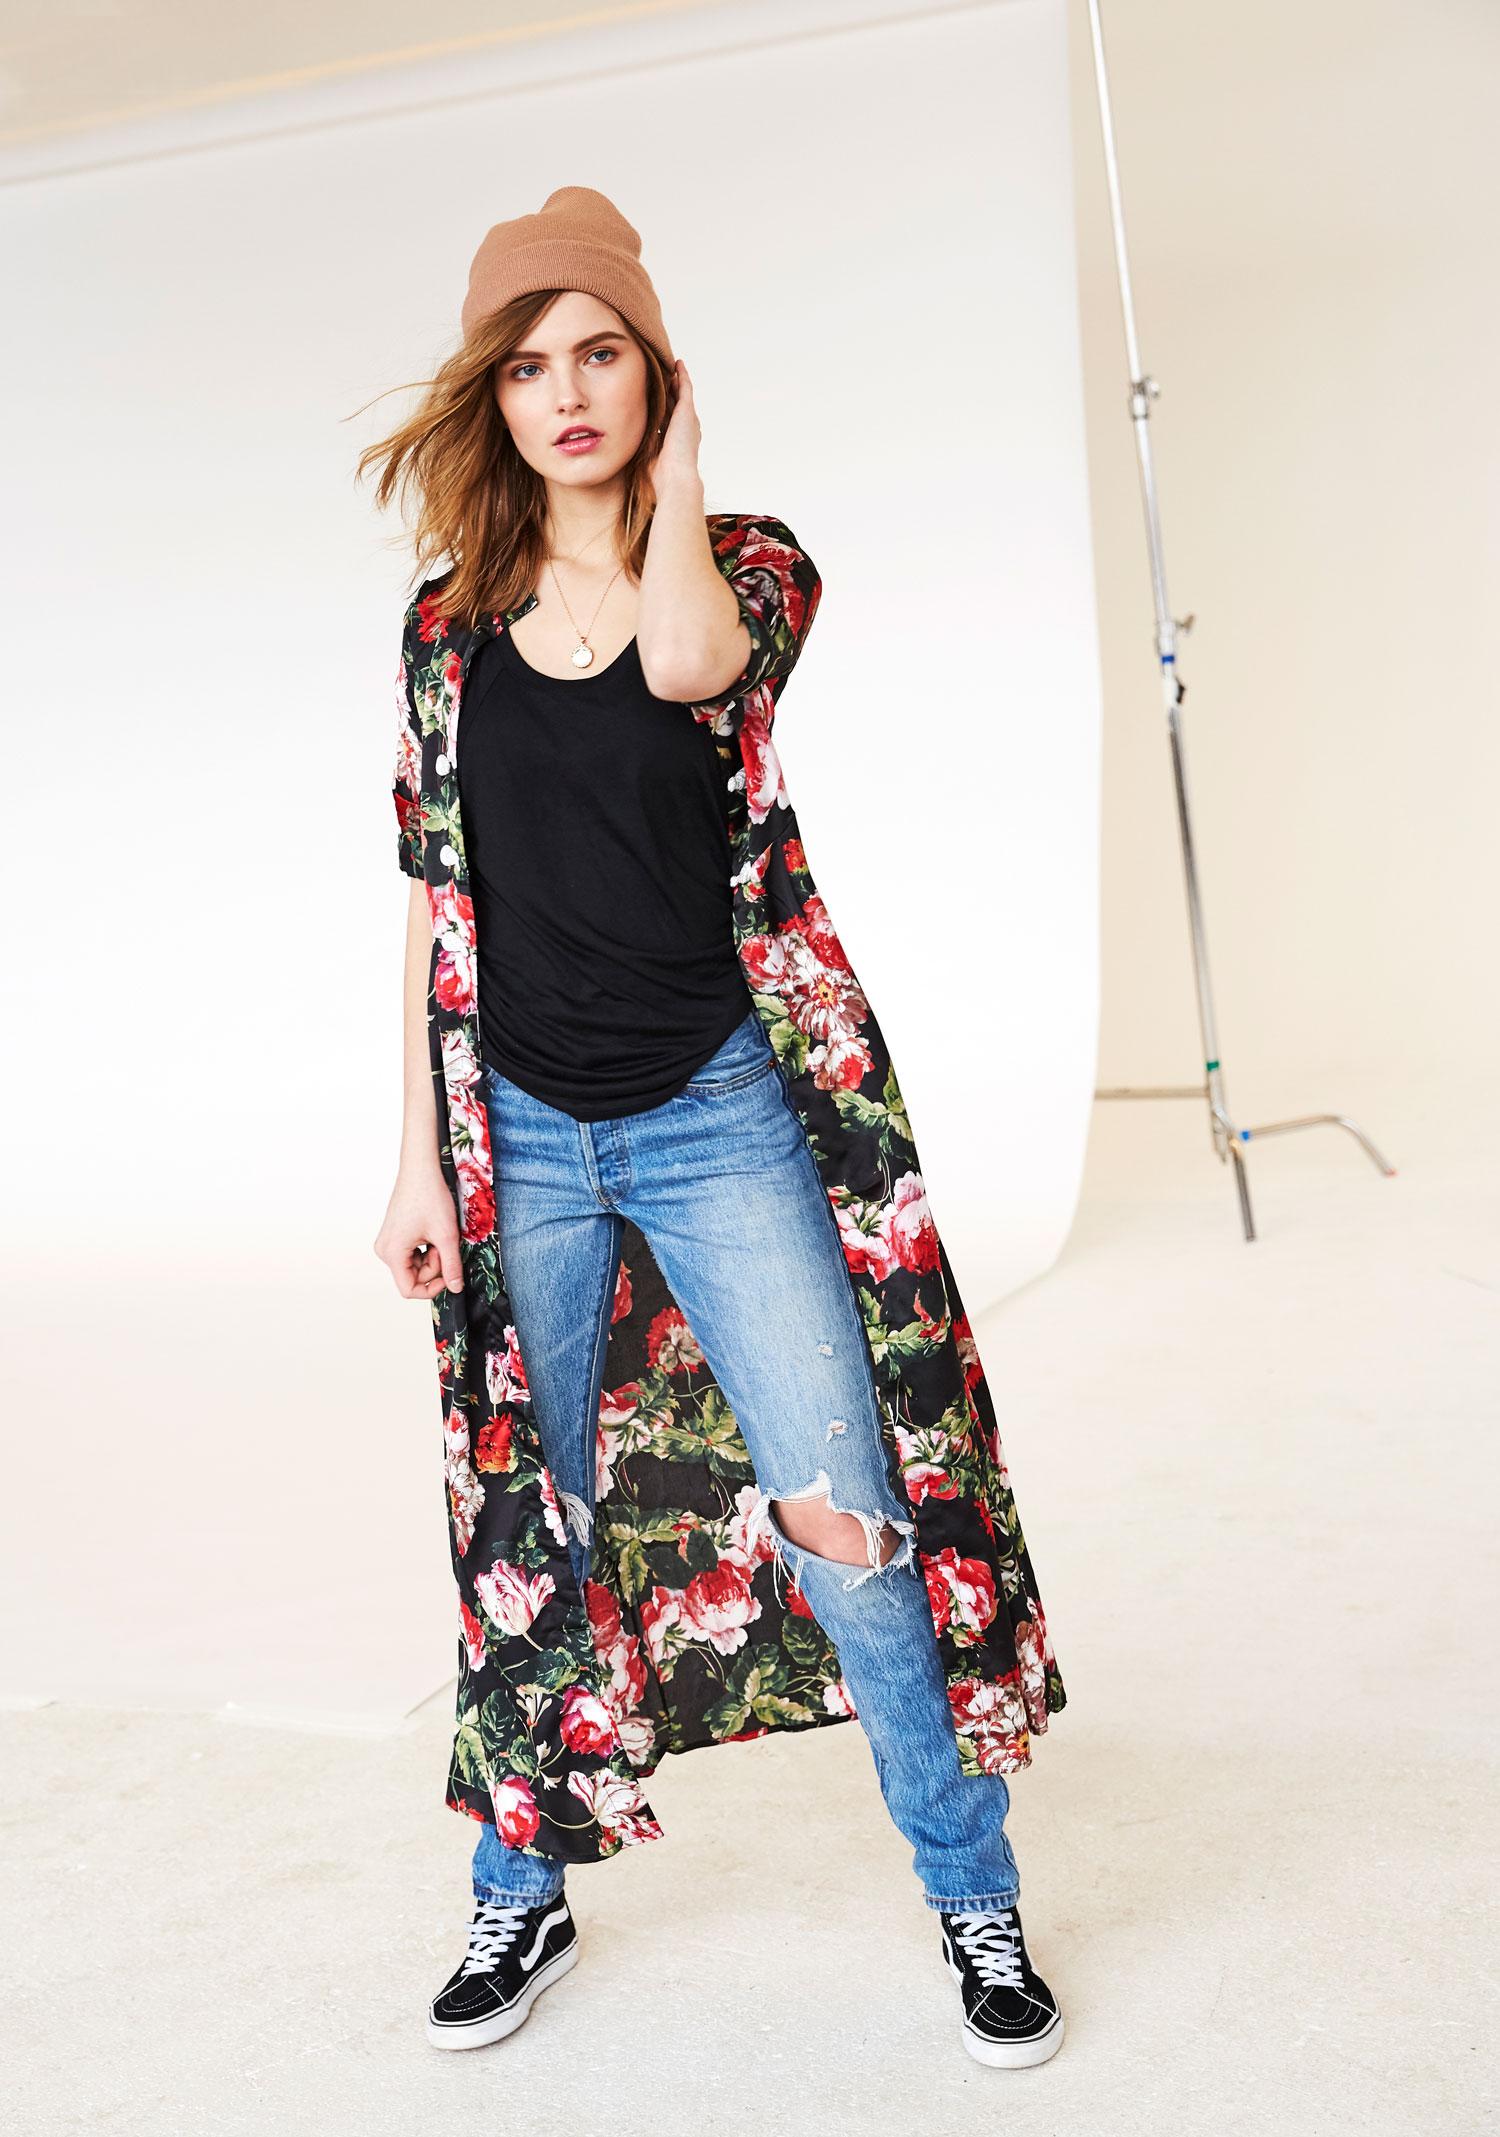 sarah-cochran-wardrobe-stylist-creative-stylist-art-director-minneapolis-5.jpg